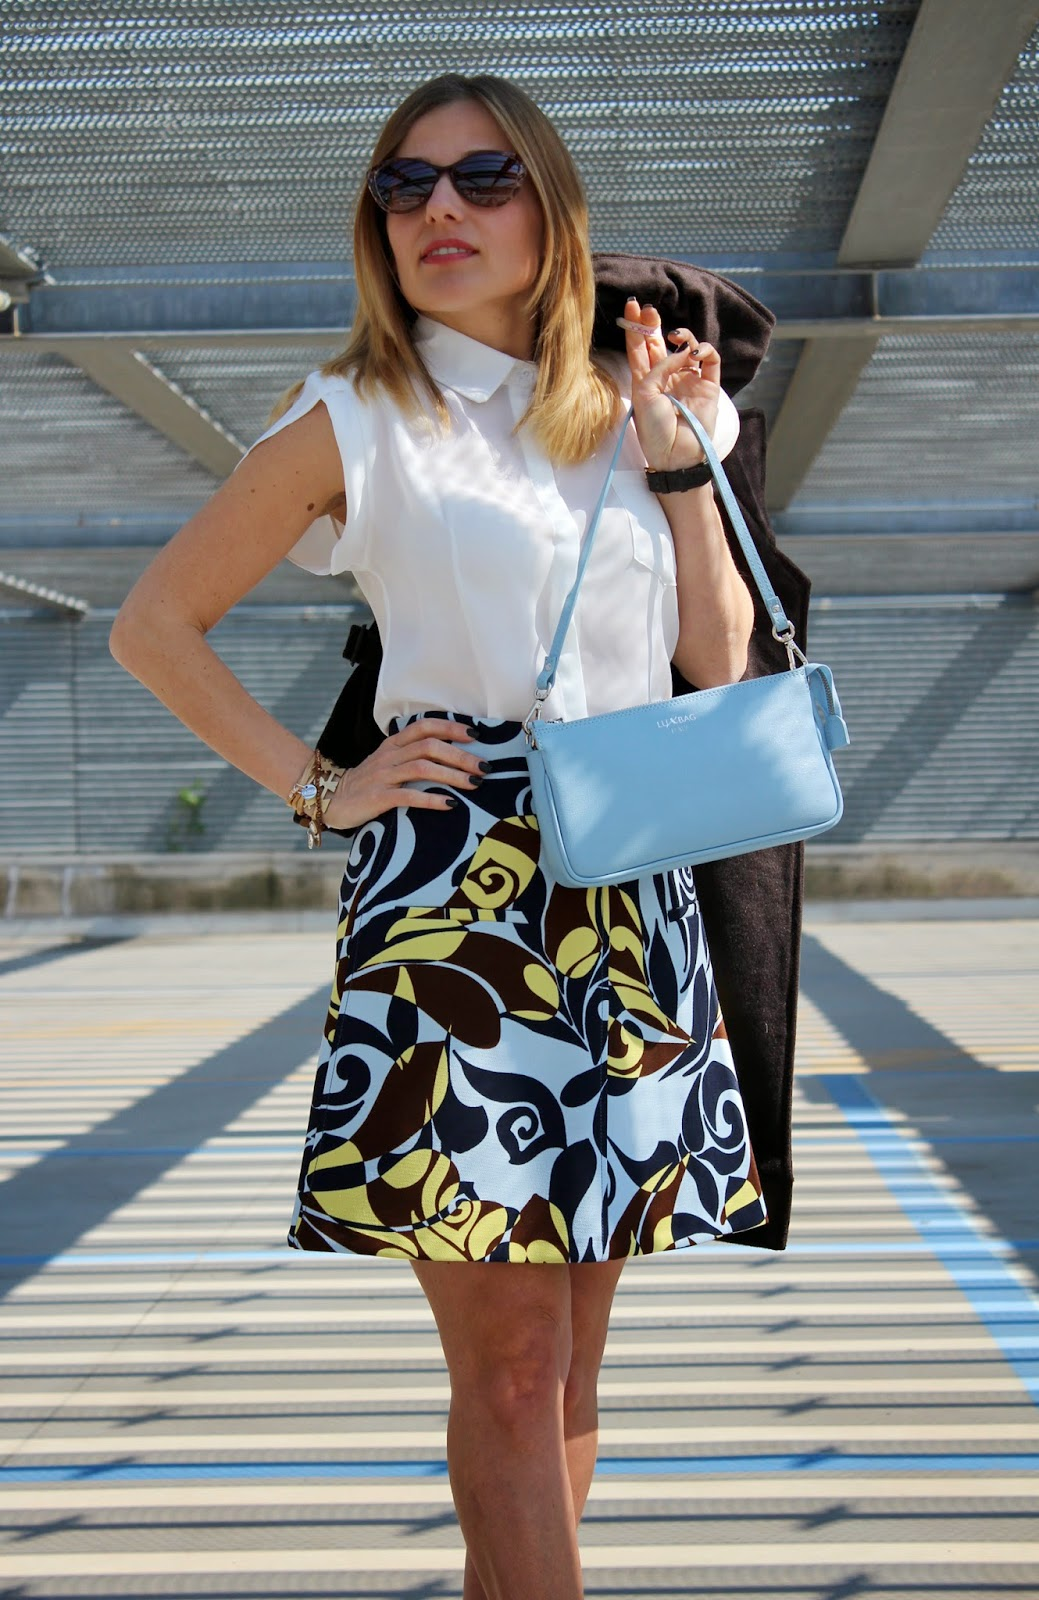 Eniwhere Fashion - Zara Skirt - Seventies - Lux Bag - Caco Design